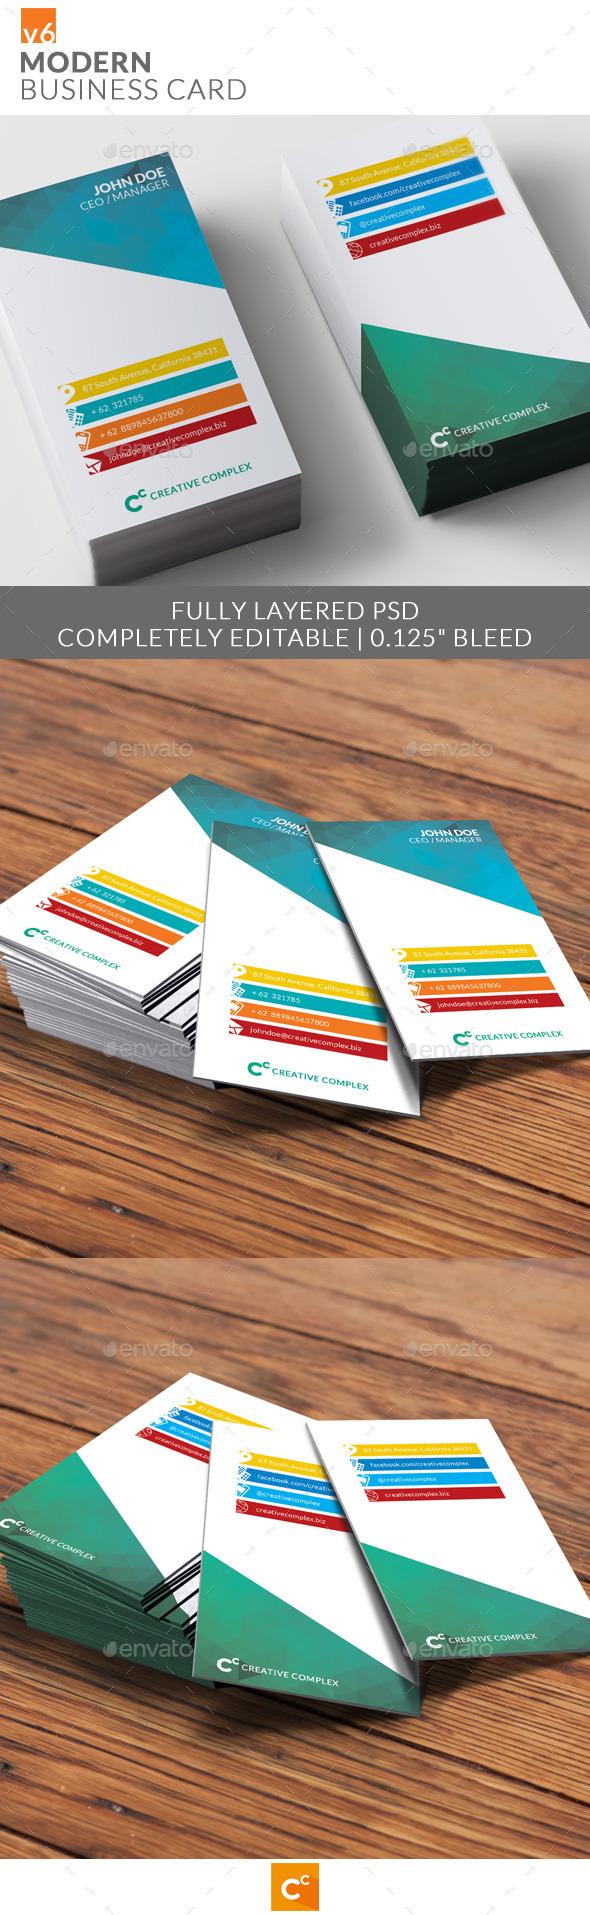 GraphicRiver Modern Business Card v6 9480134